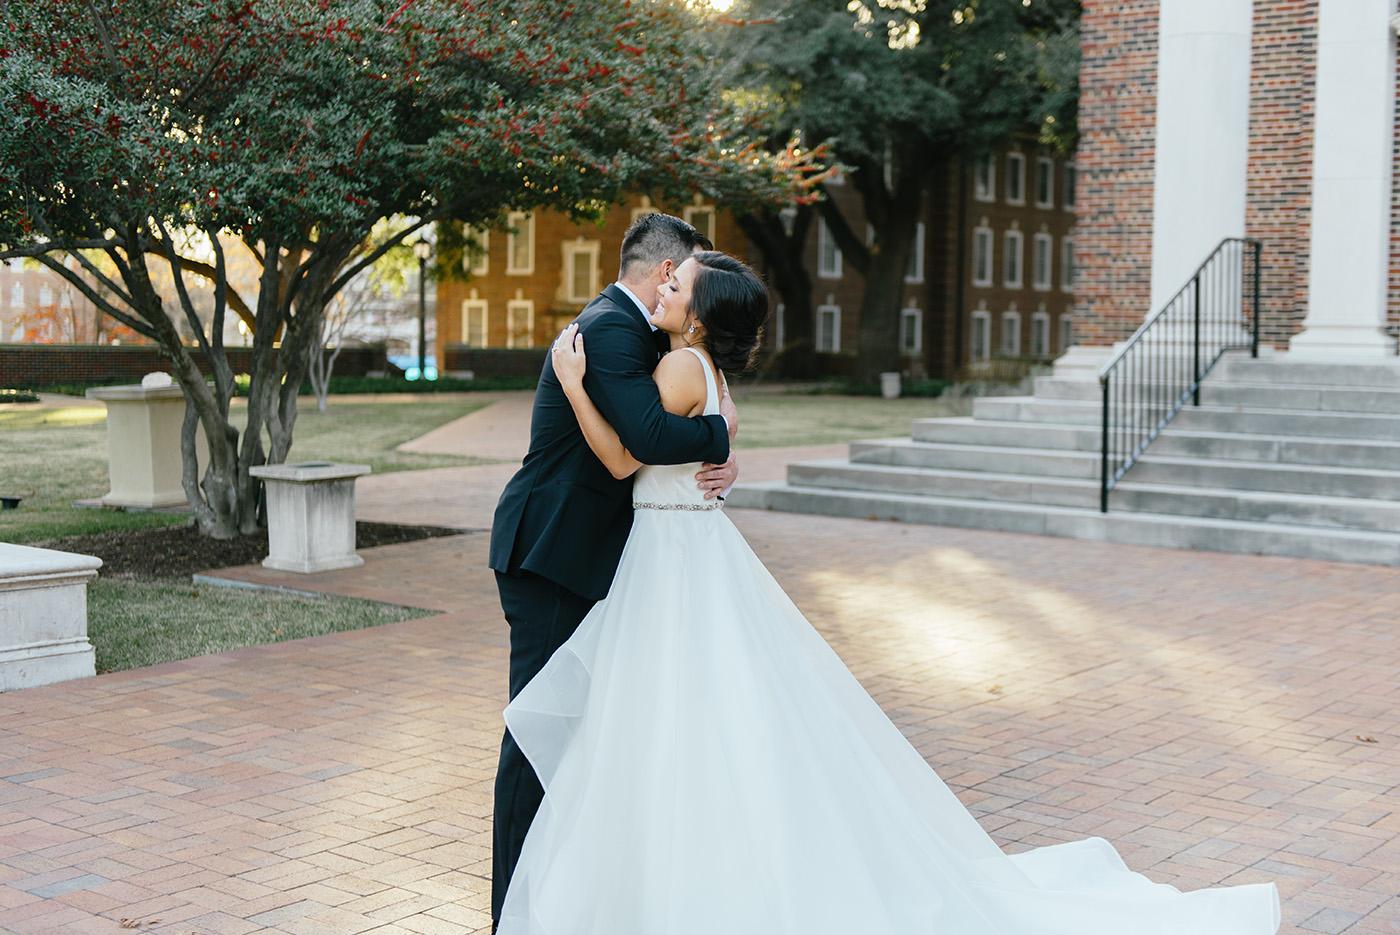 Dallas Wedding Planner - Winter Wedding at The Room on Main - Allday Events - 108.jpg